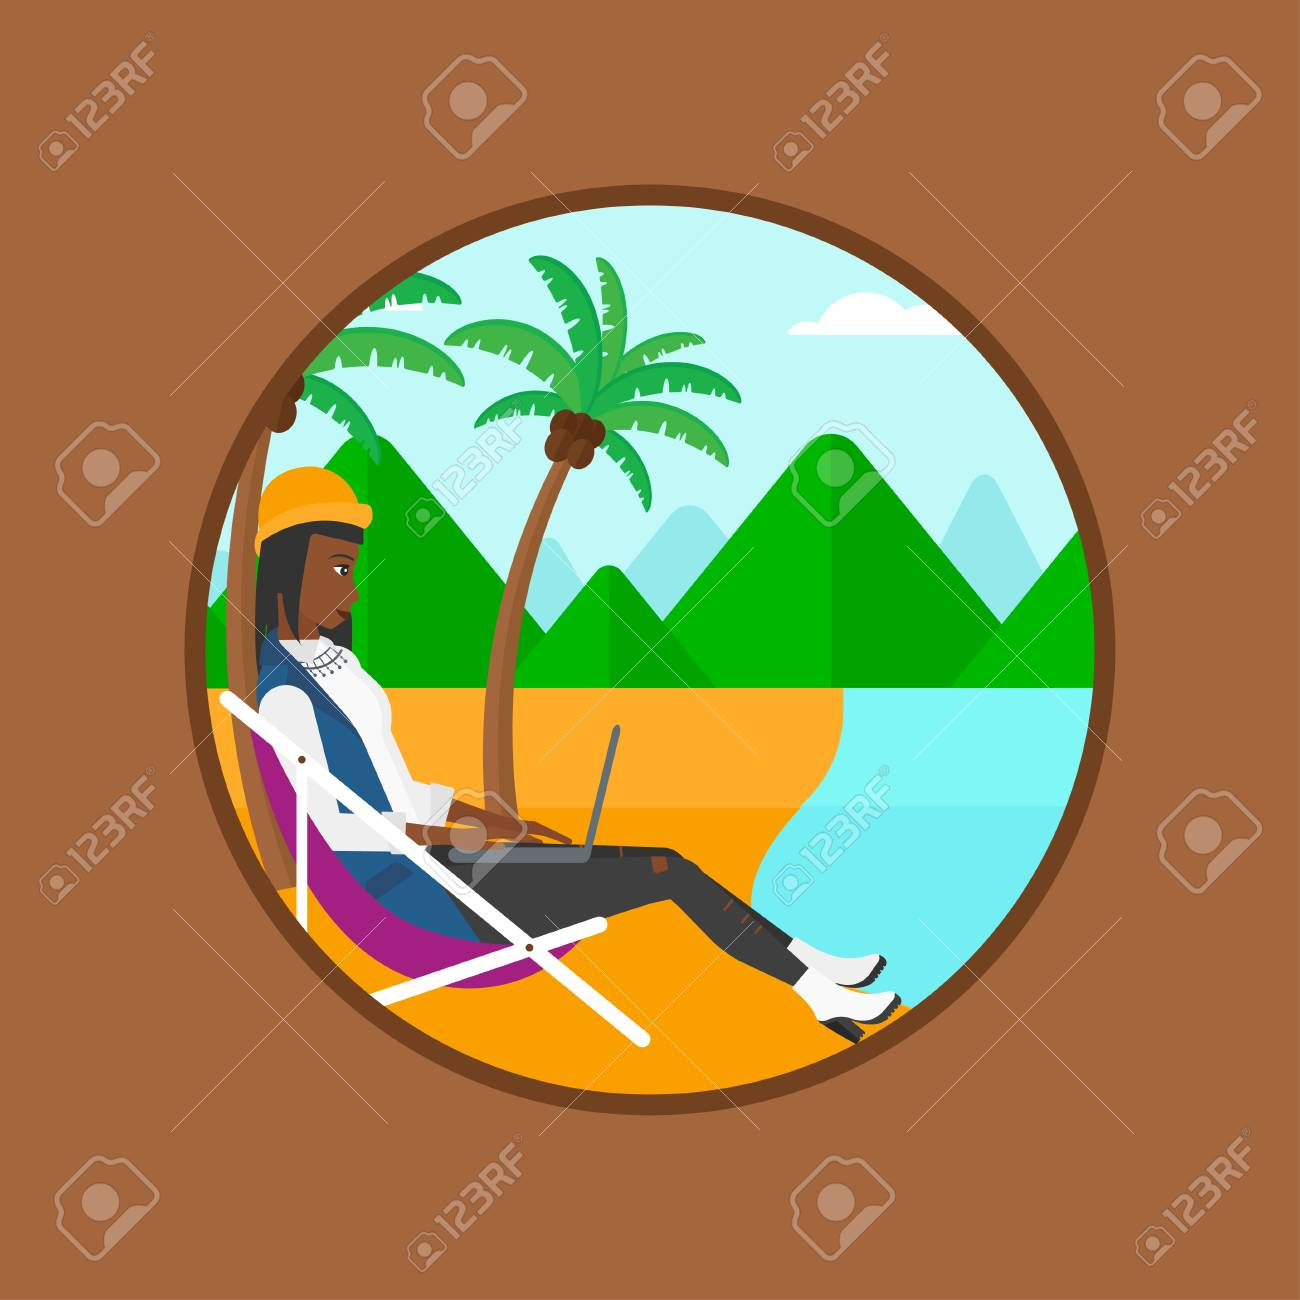 Une Femme D'affaires Afro-américaine is Dans Une Chaise Longue Et on chaise recliner chair, chaise sofa sleeper, chaise furniture,